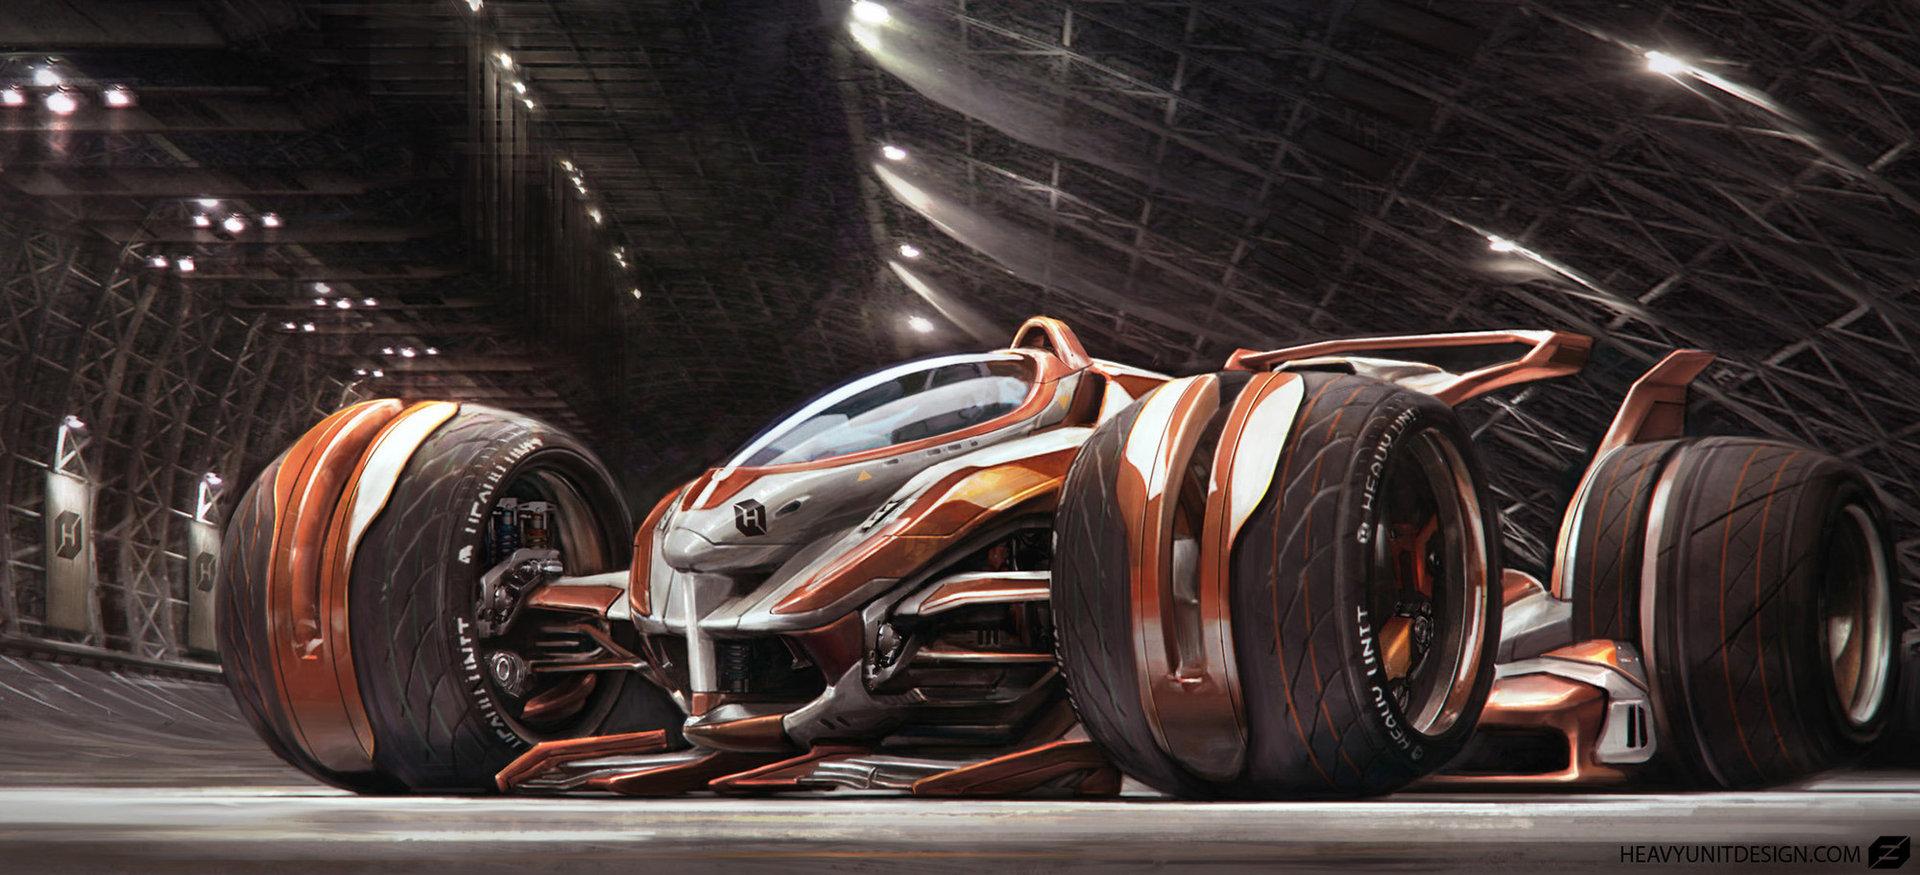 The Futuristic Concept Art Of Mike Hill Digital Sci Fi